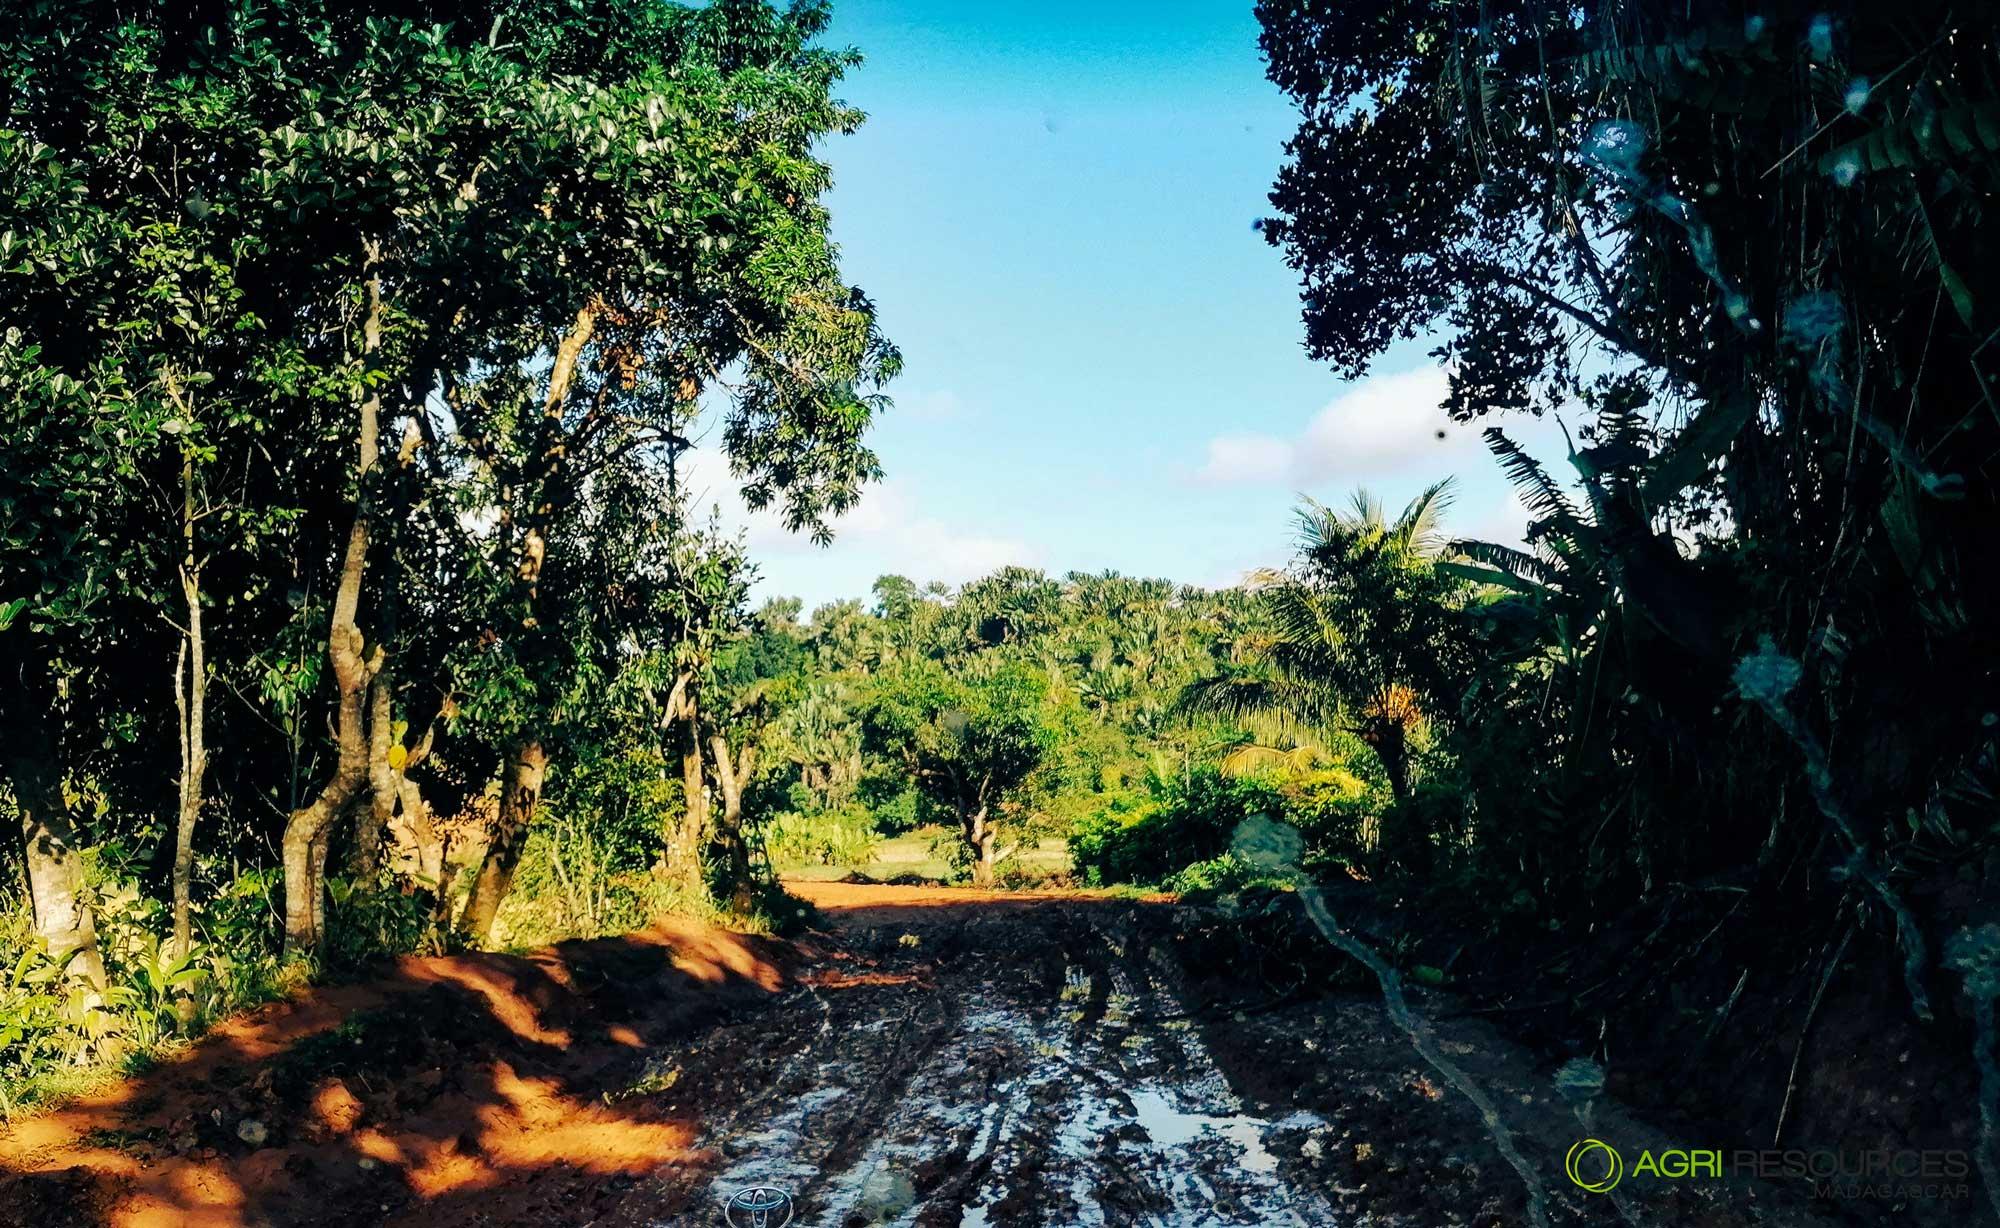 Green-Vanilla-Campaign-2021---Agri-Resources-Madagascar-10